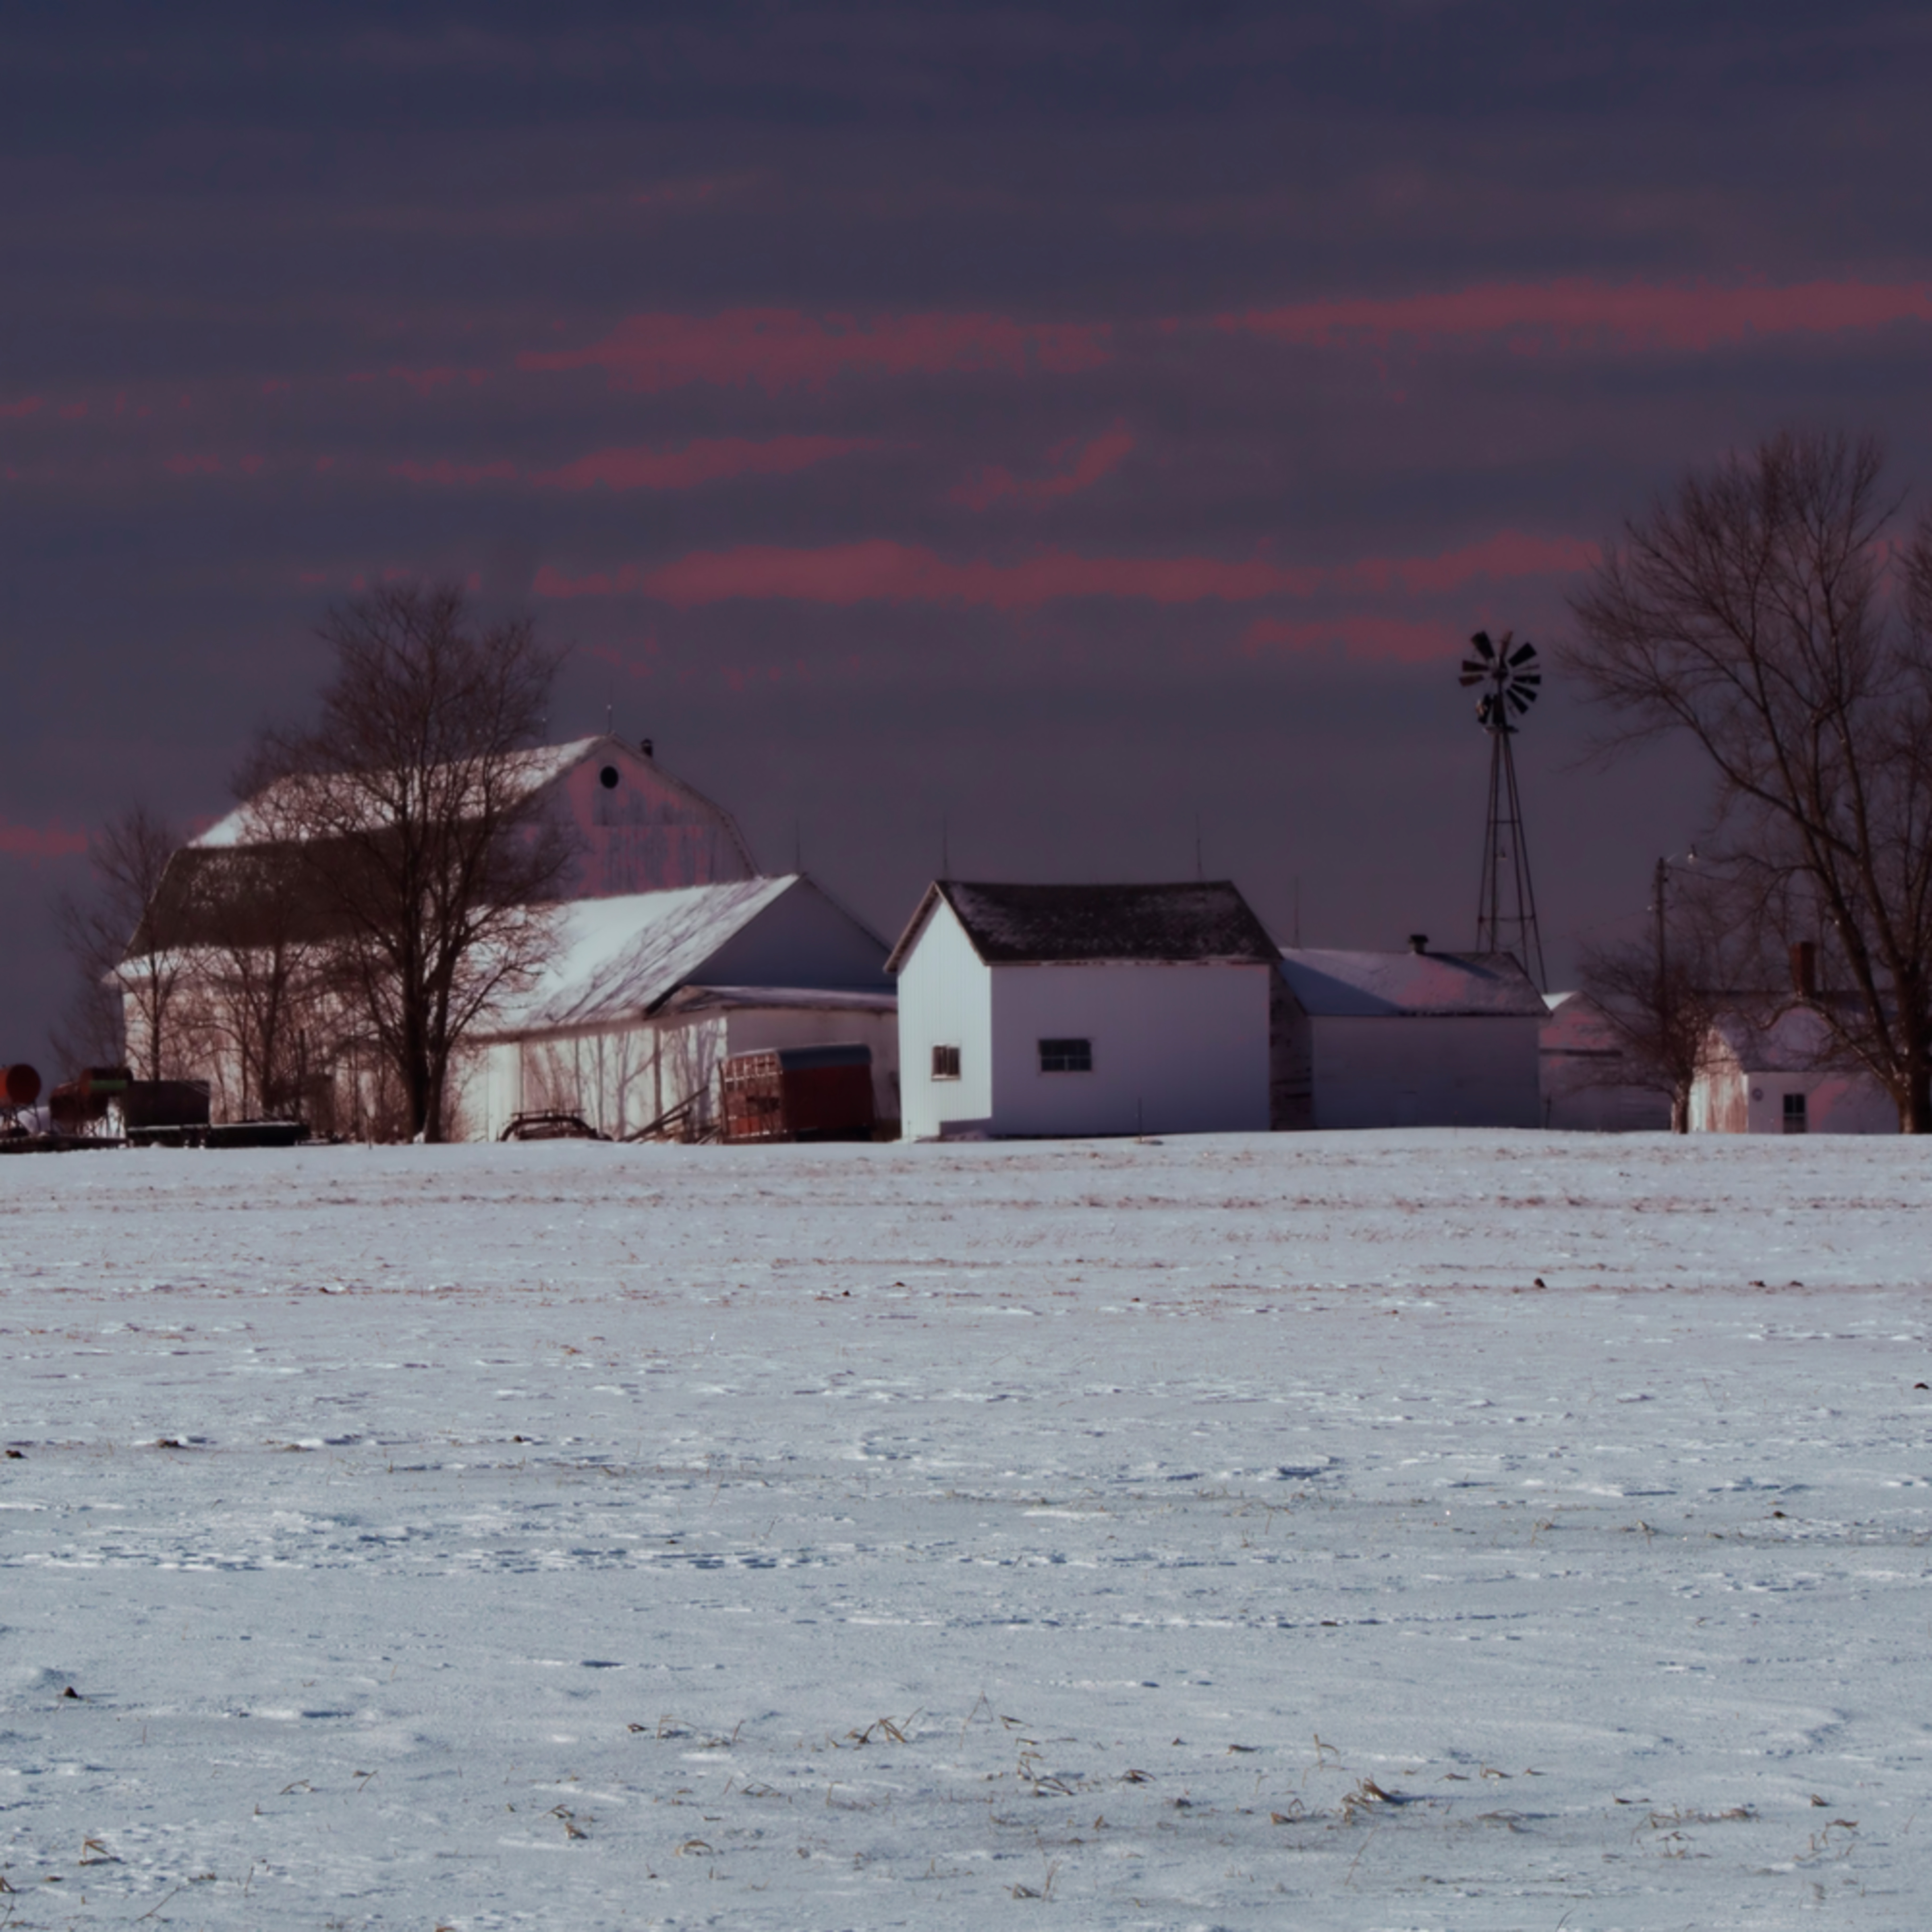 Winter twilite fumjv5